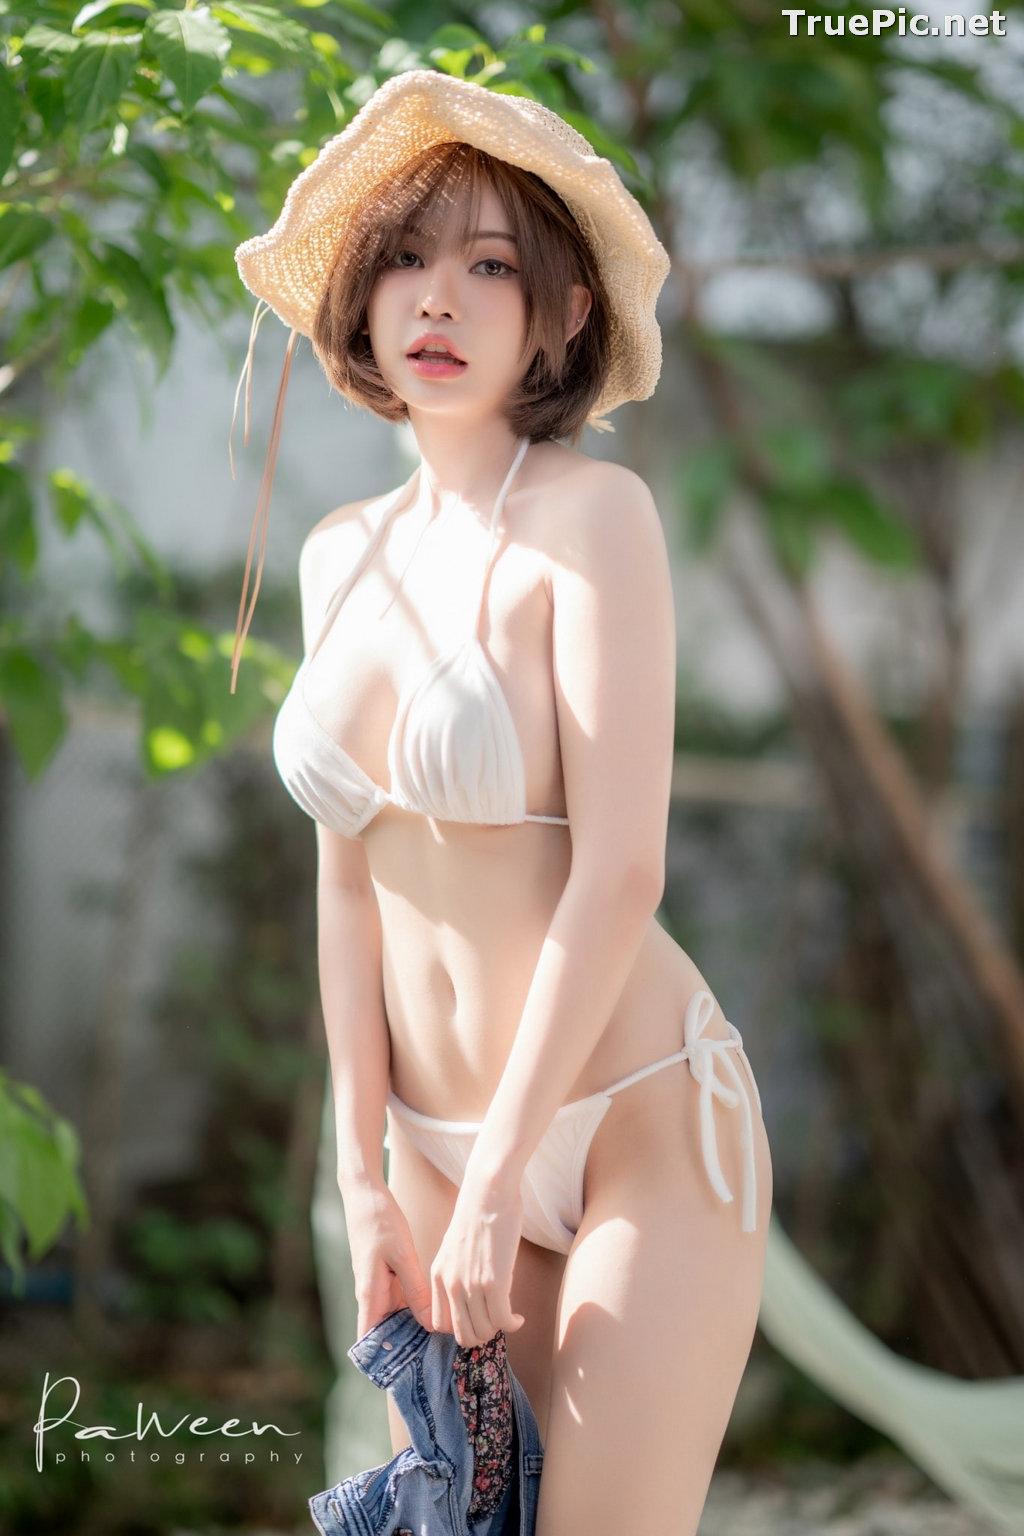 Image Thailand Model - Sutasinee Nokia Sirirak - White Sexy Bikini - TruePic.net - Picture-5